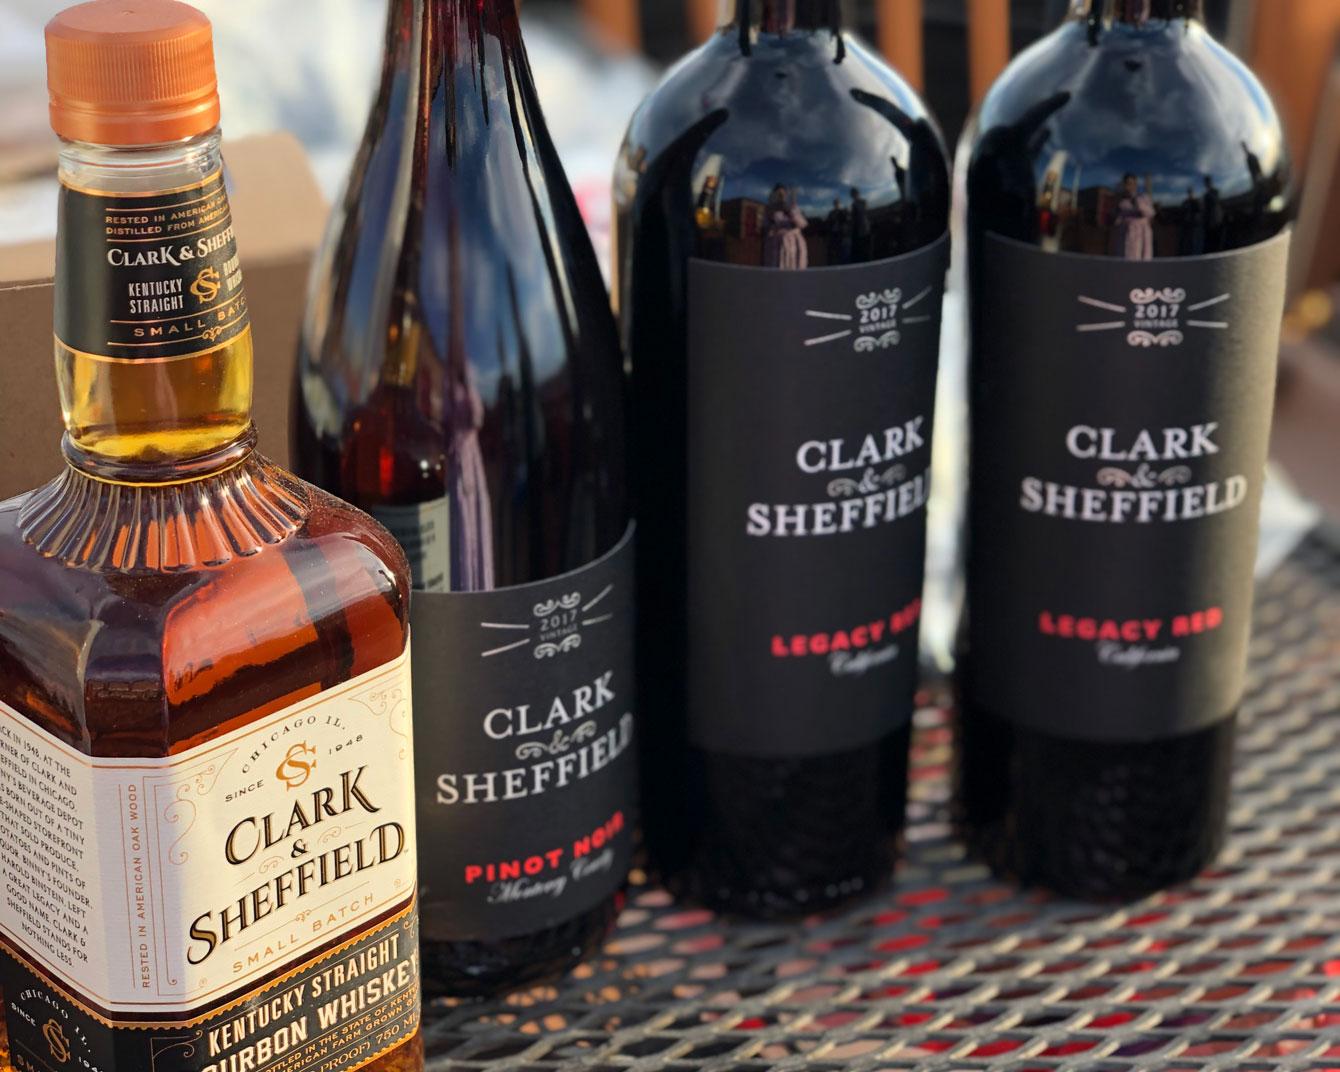 Clark Sheffield Wine